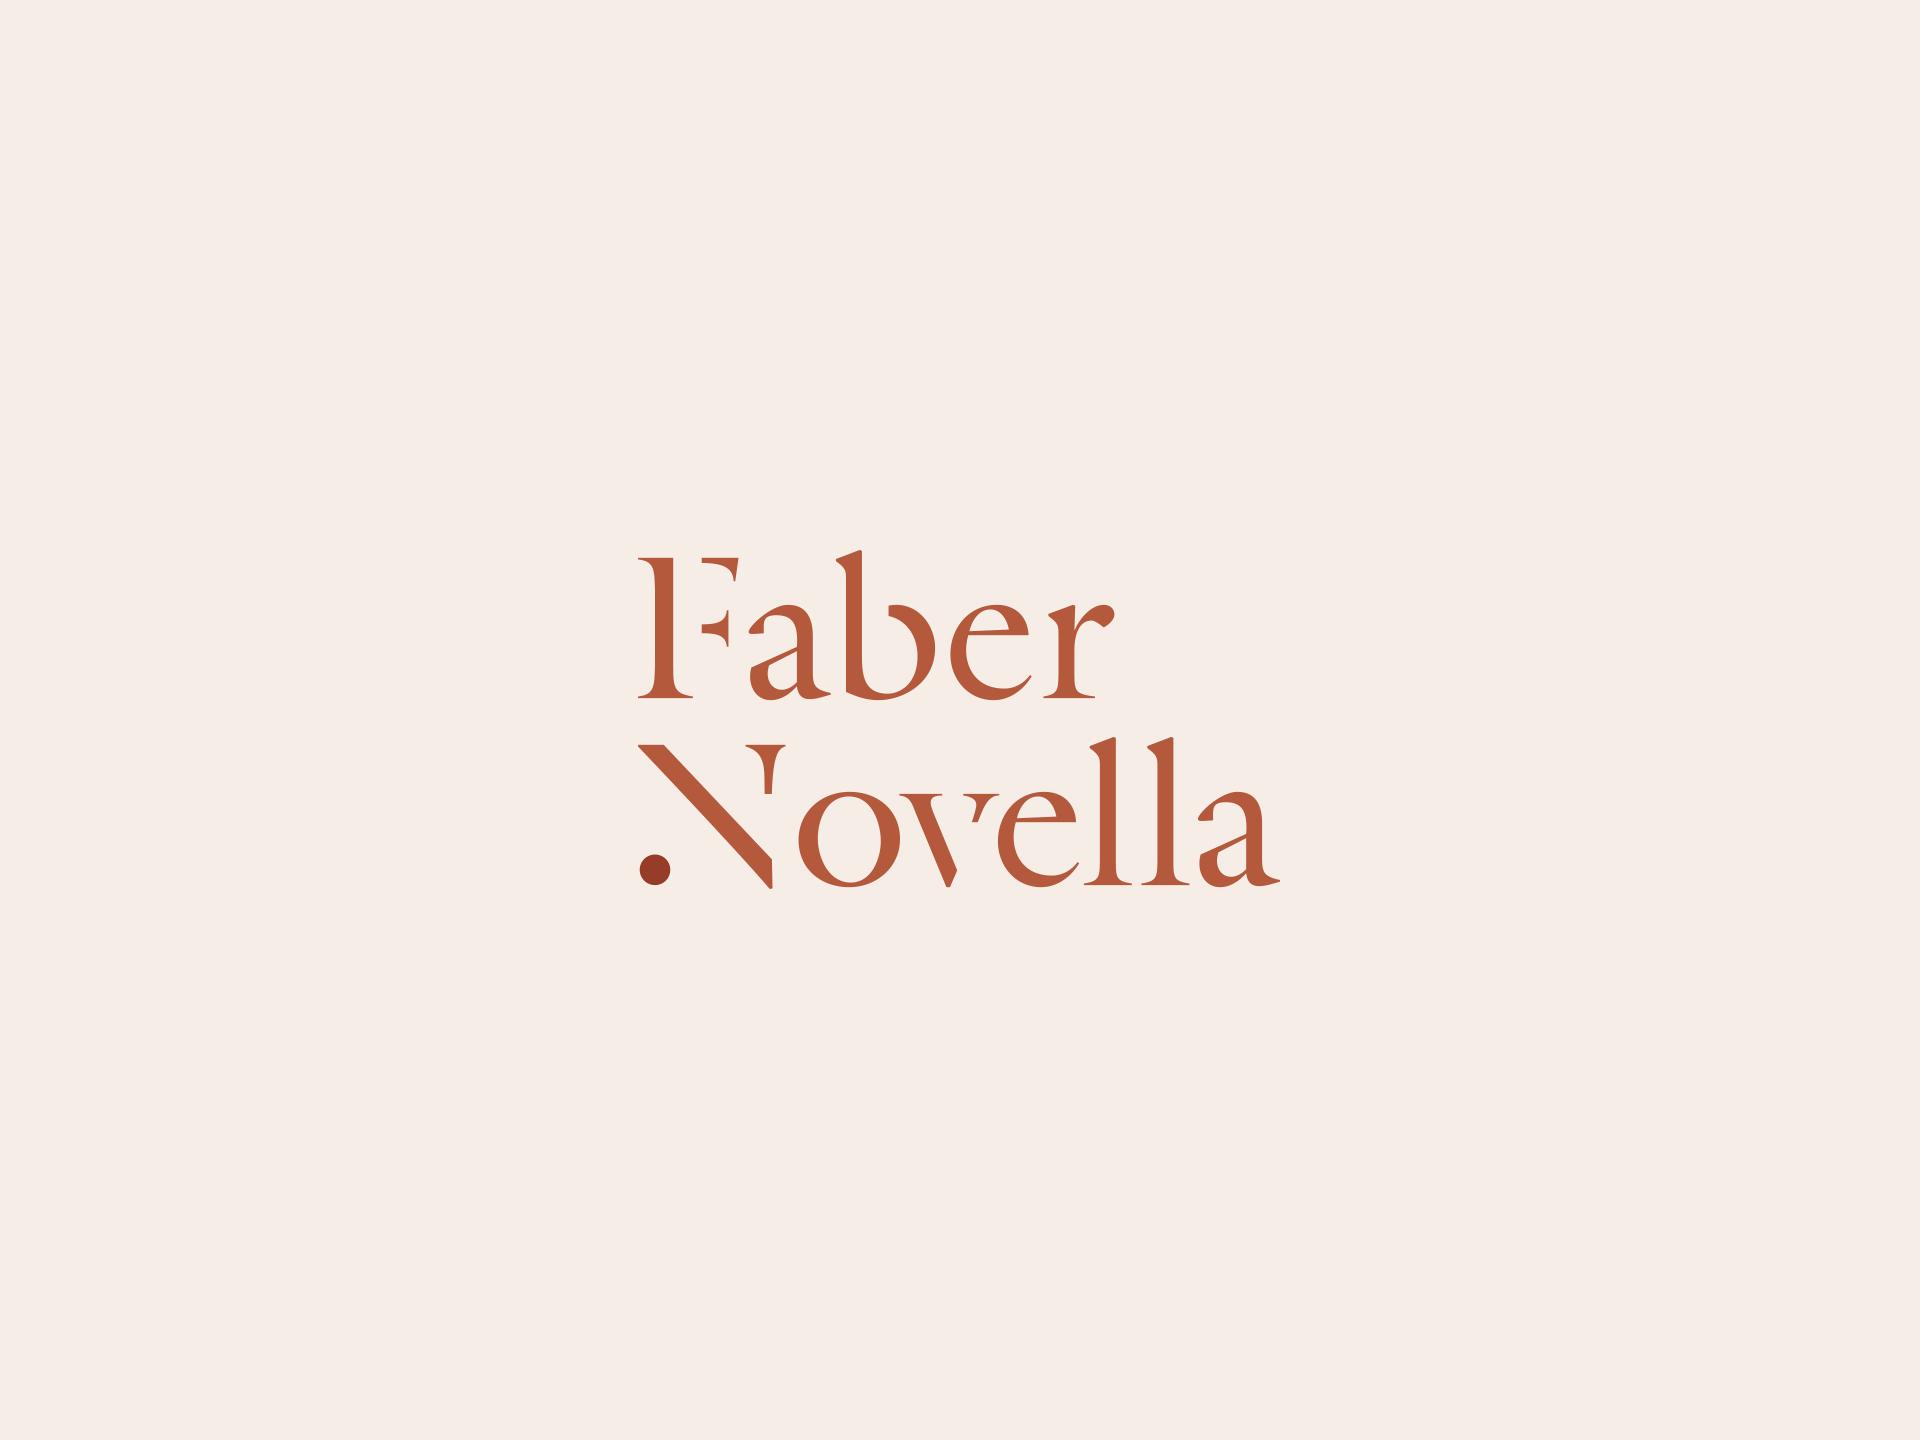 Faber Novella